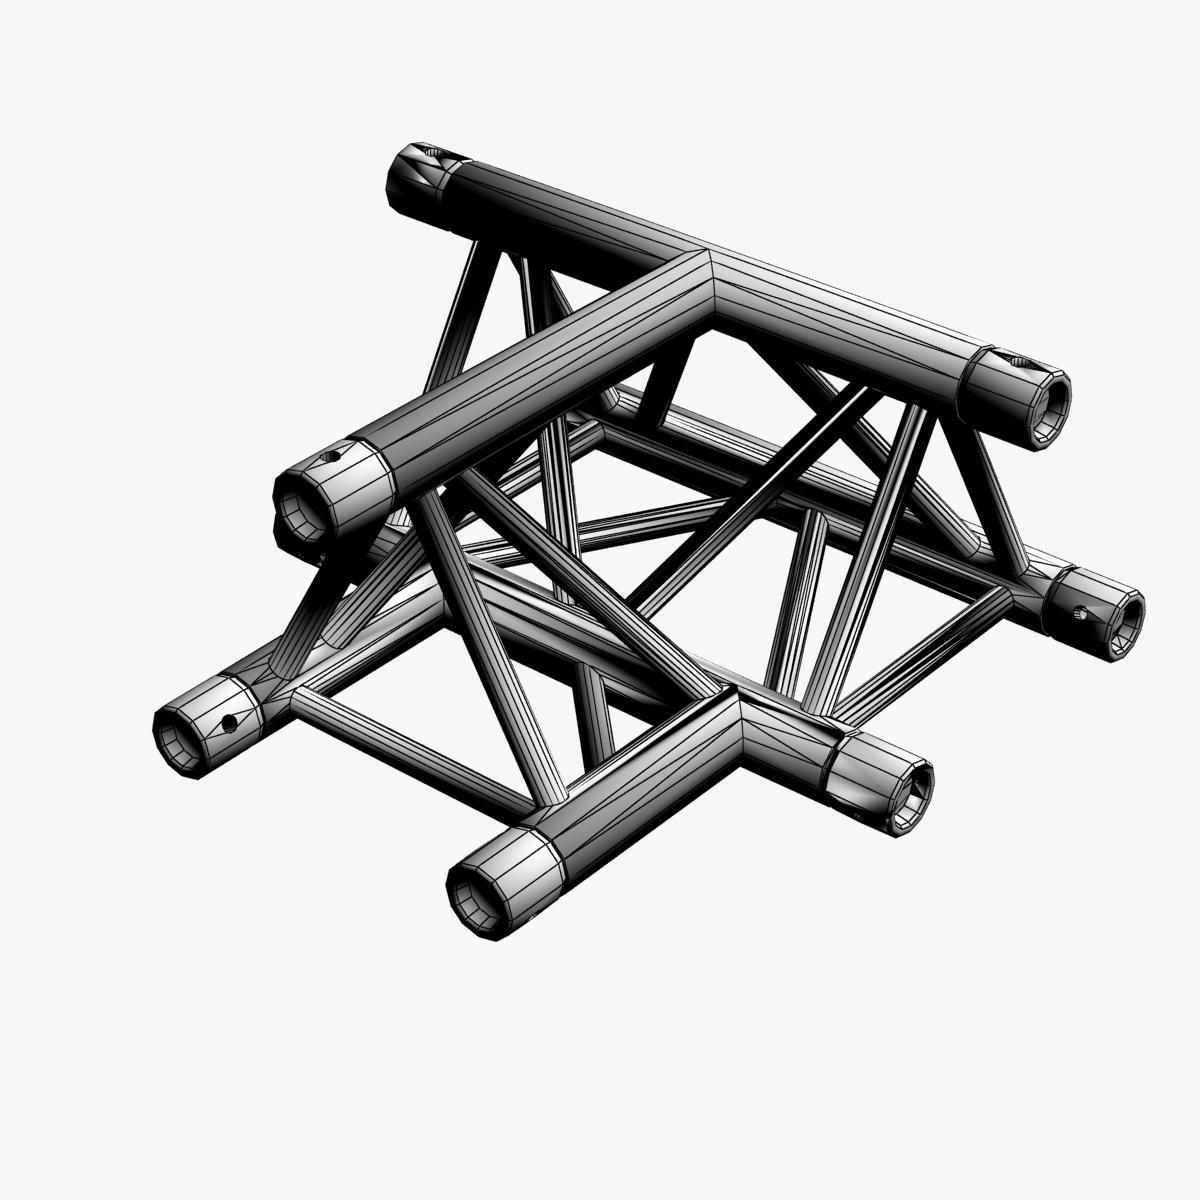 Triangular Truss Cross T Junction 84 3d model 3ds max dxf fbx b3d c4d  obj 268955